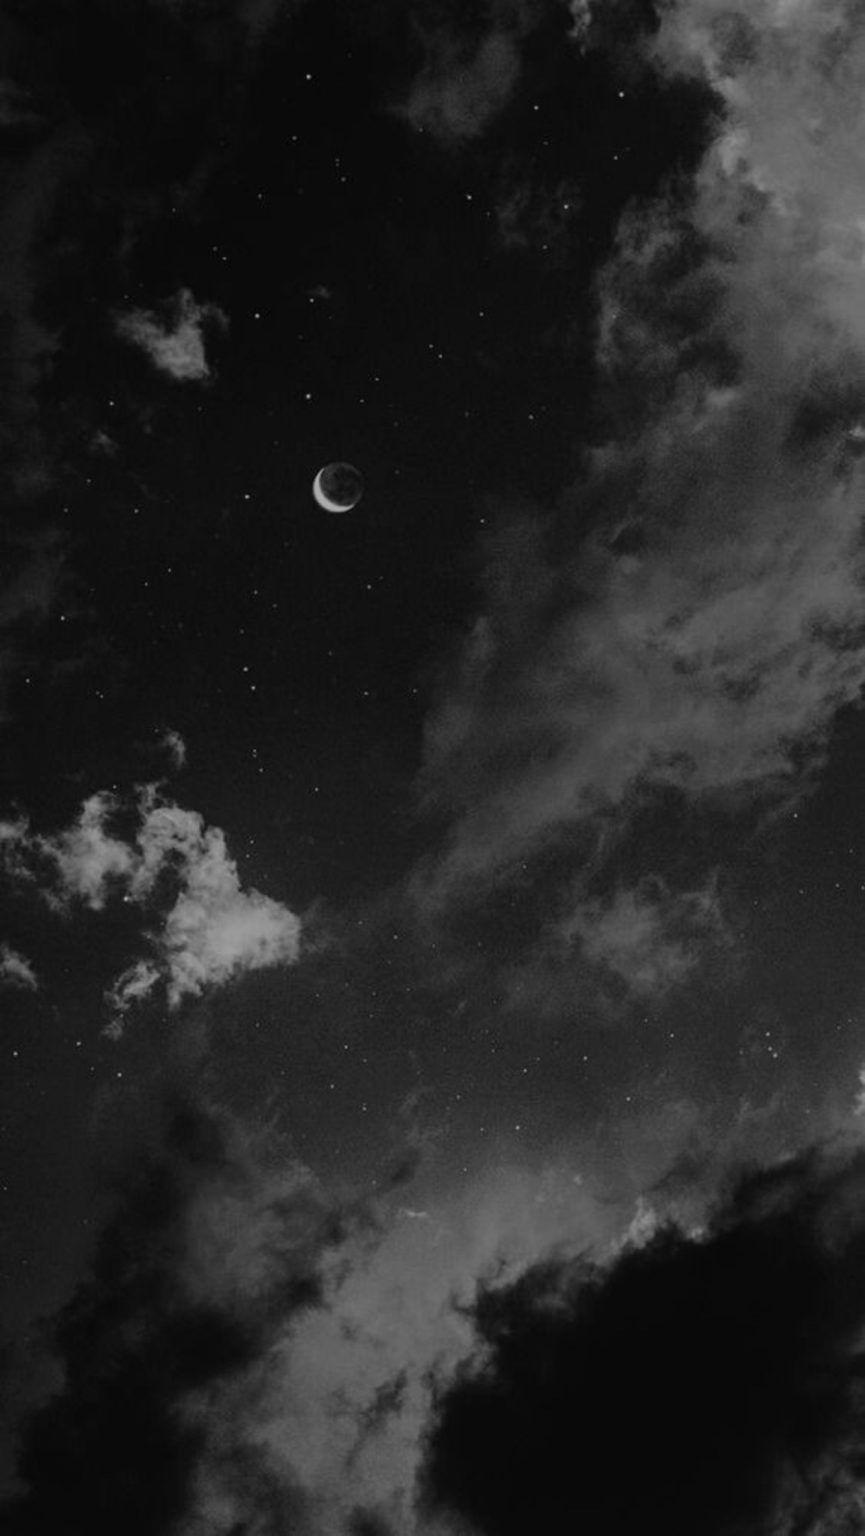 Iphone Wallpaper Sky Black Atmosphere Cloud Black And White Moon Black Aesthetic Wallpaper Dark Wallpaper Iphone Black Phone Wallpaper